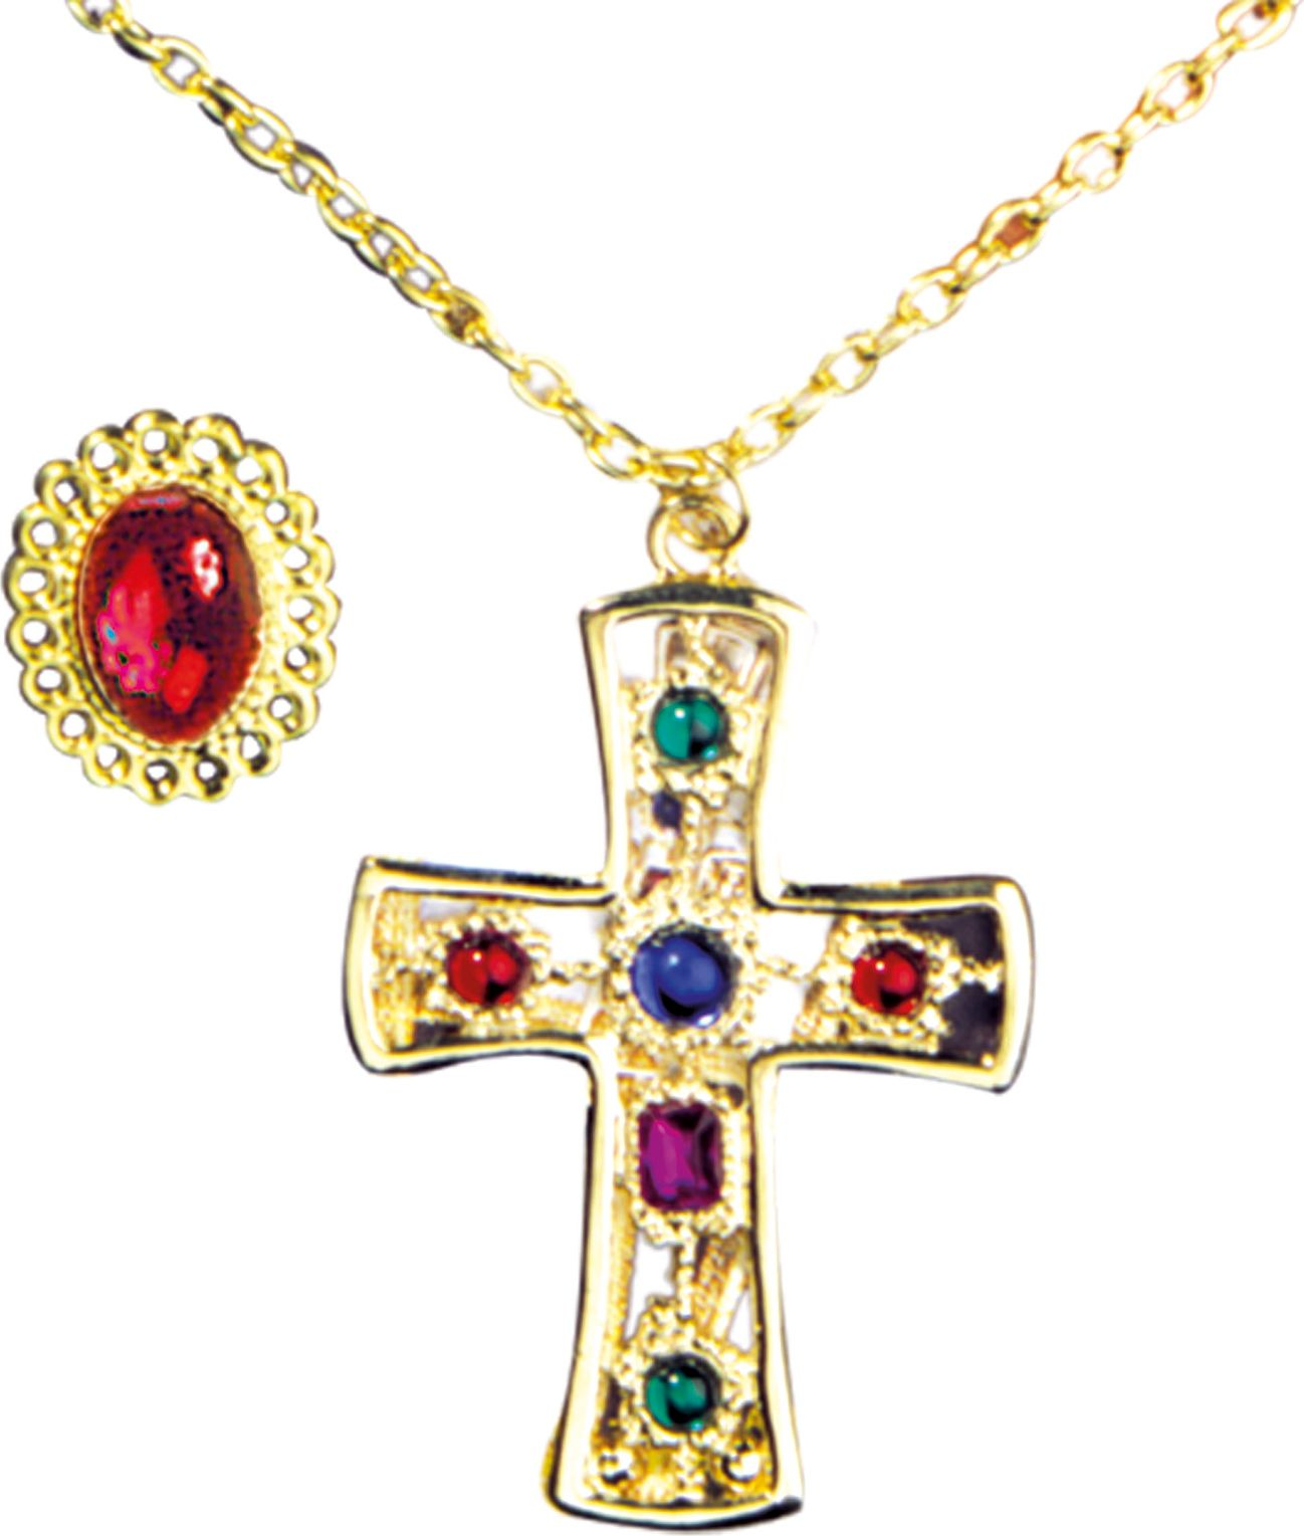 Middeleeuwse koning sieraden set